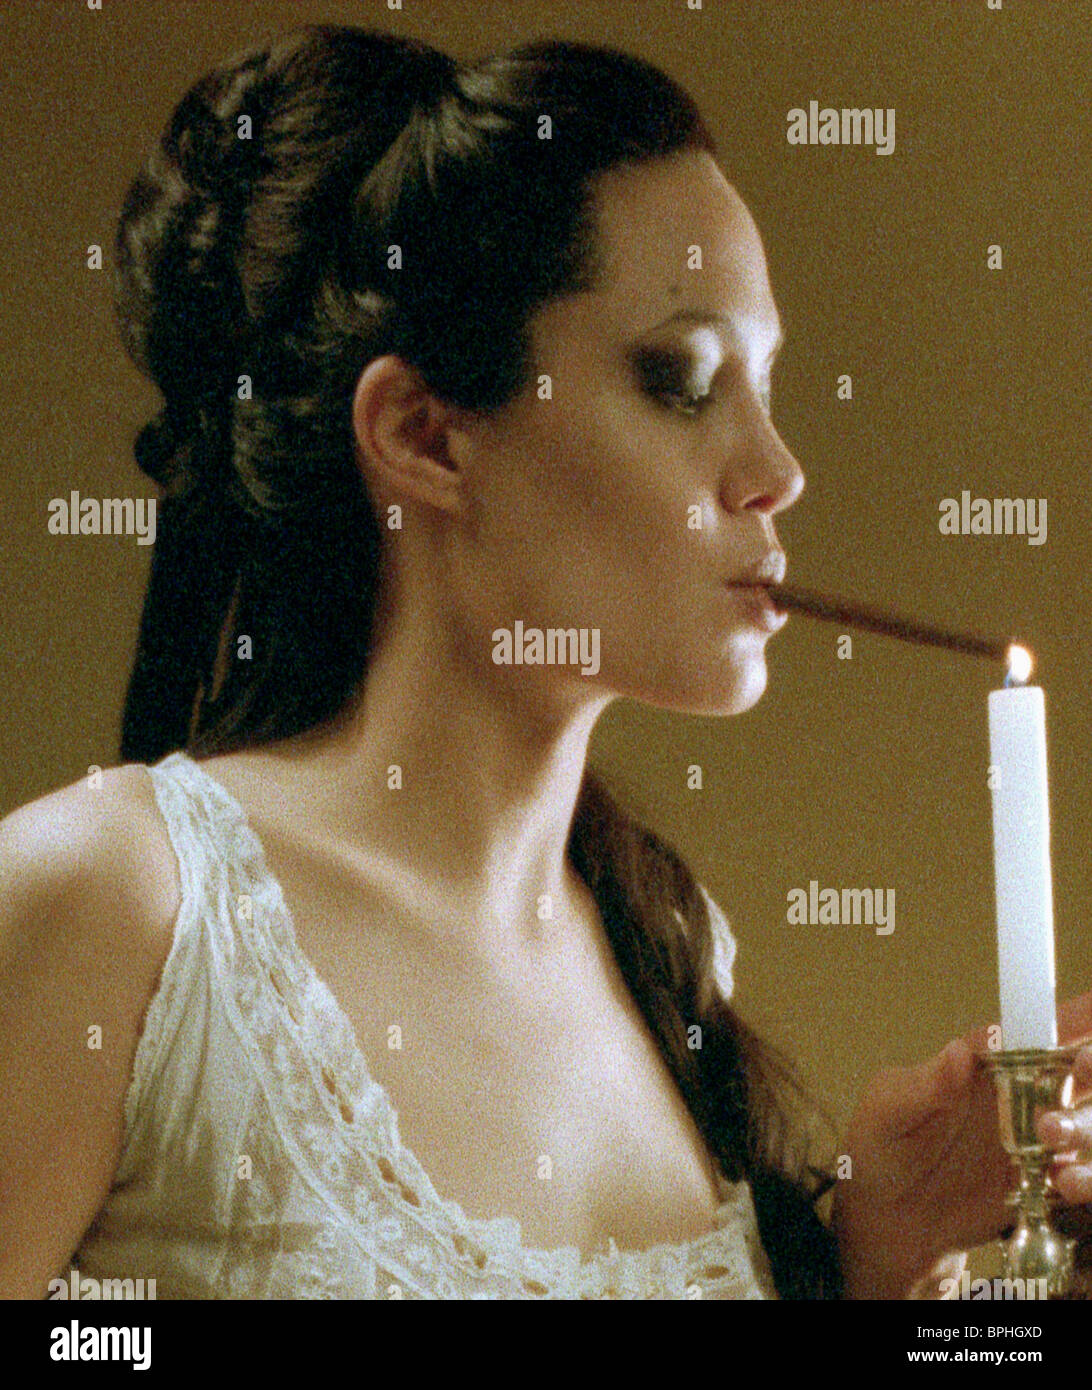 100 Pictures of Angelina Jolie Pecado Original